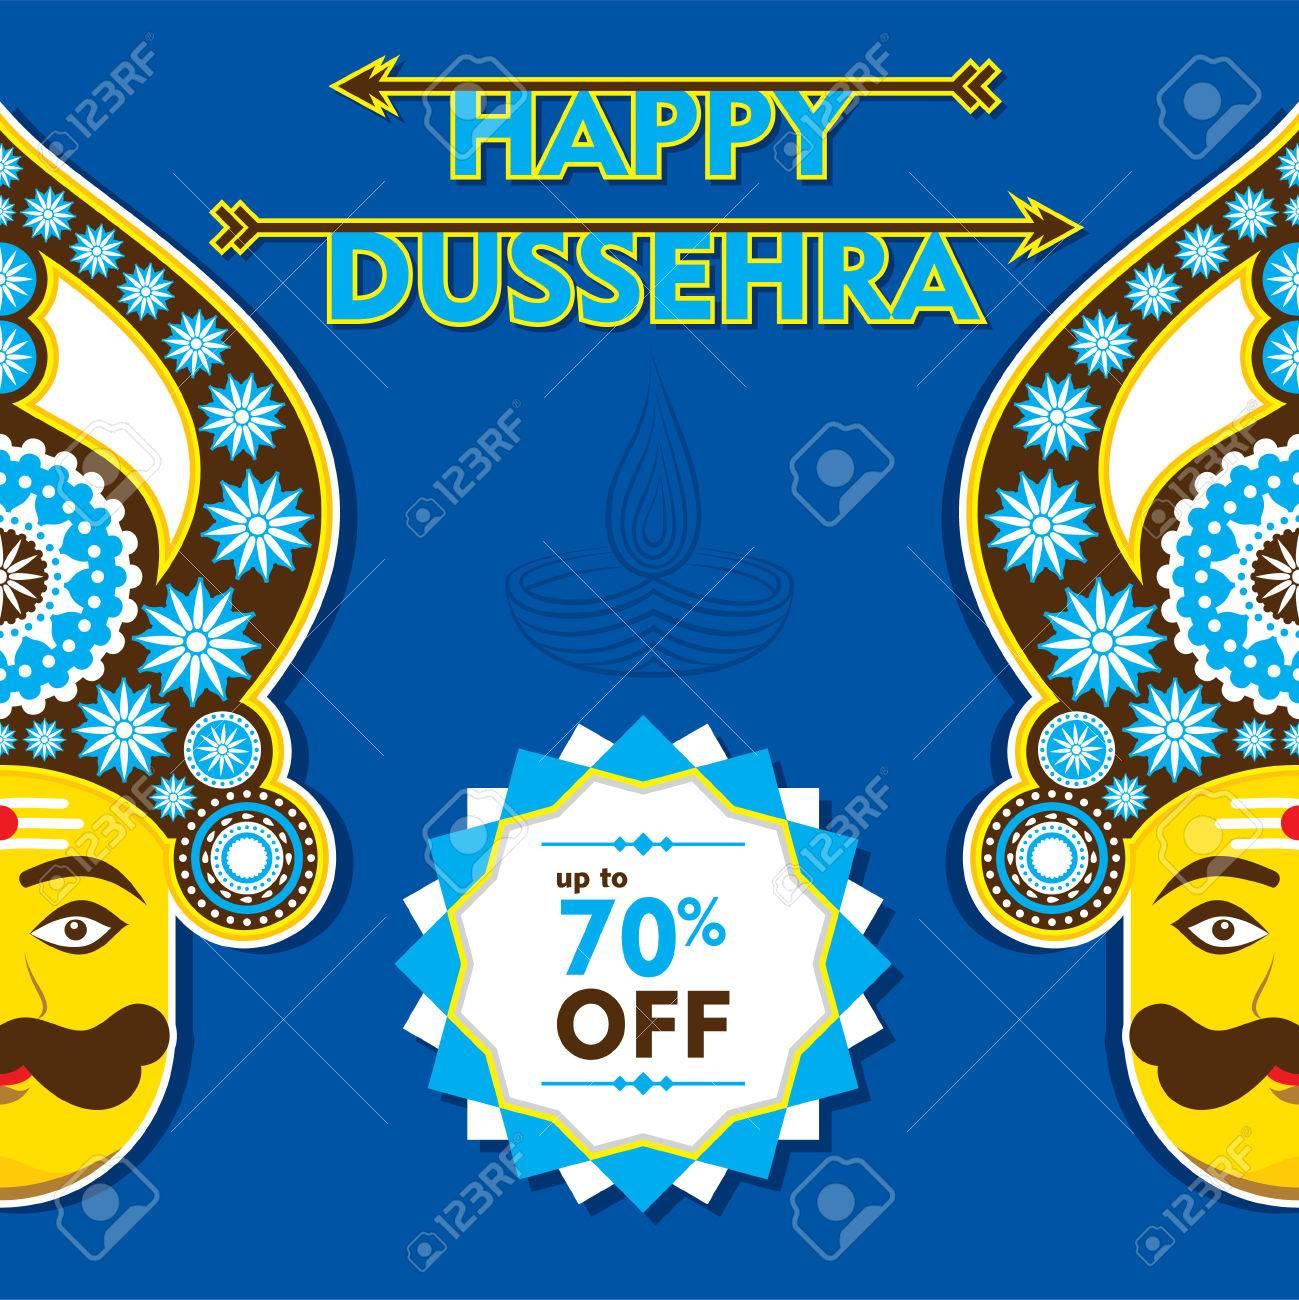 Happy dussehra banner or greeting design vector royalty free happy dussehra banner or greeting design vector stock vector 46135209 kristyandbryce Images